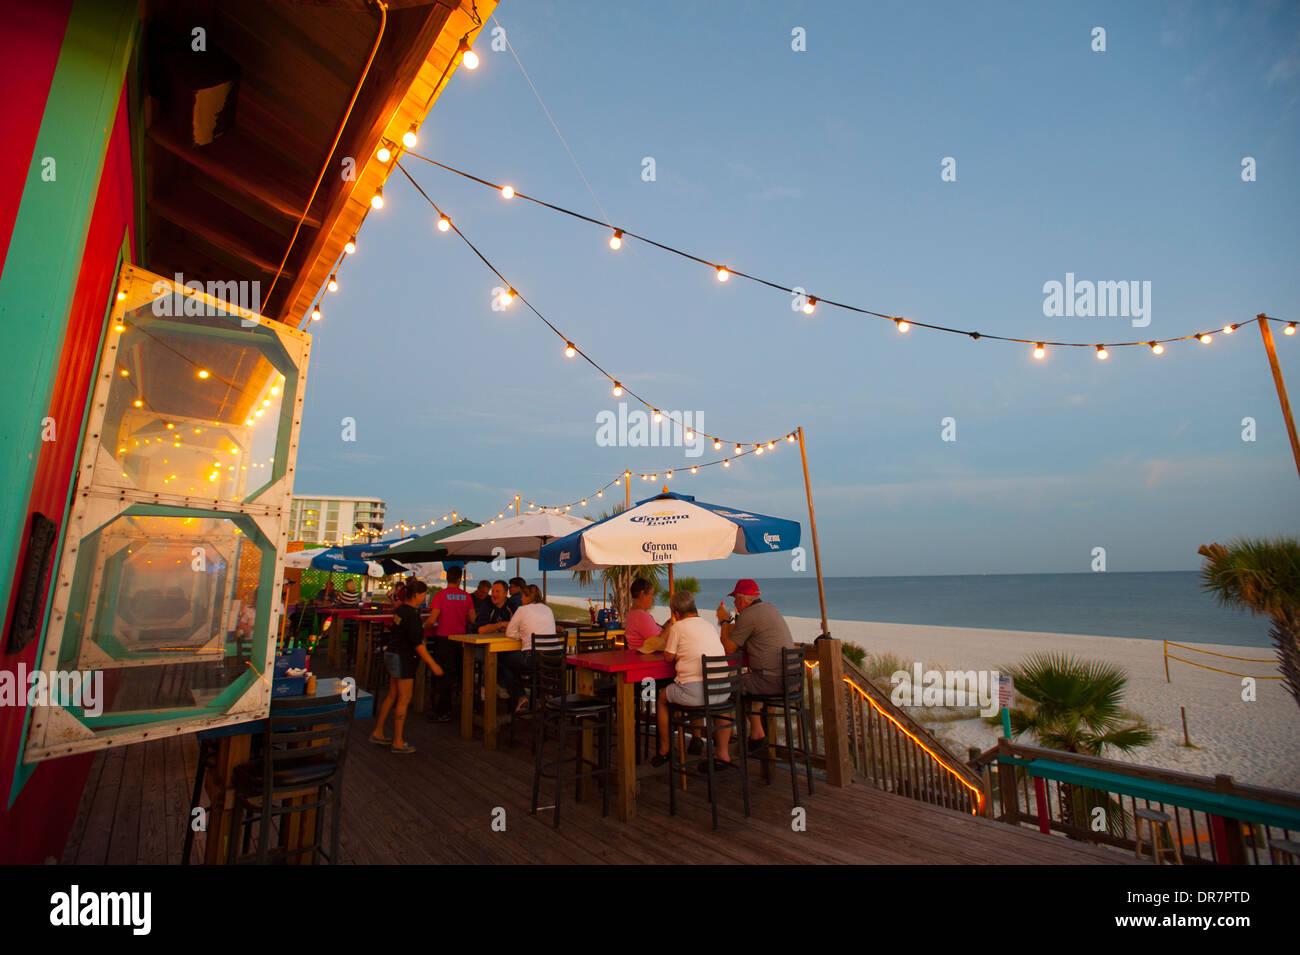 usa-mississippi-ms-biloxi-shaggys-biloxi-beach-bar-and-restaurtant-DR7PTD.jpg